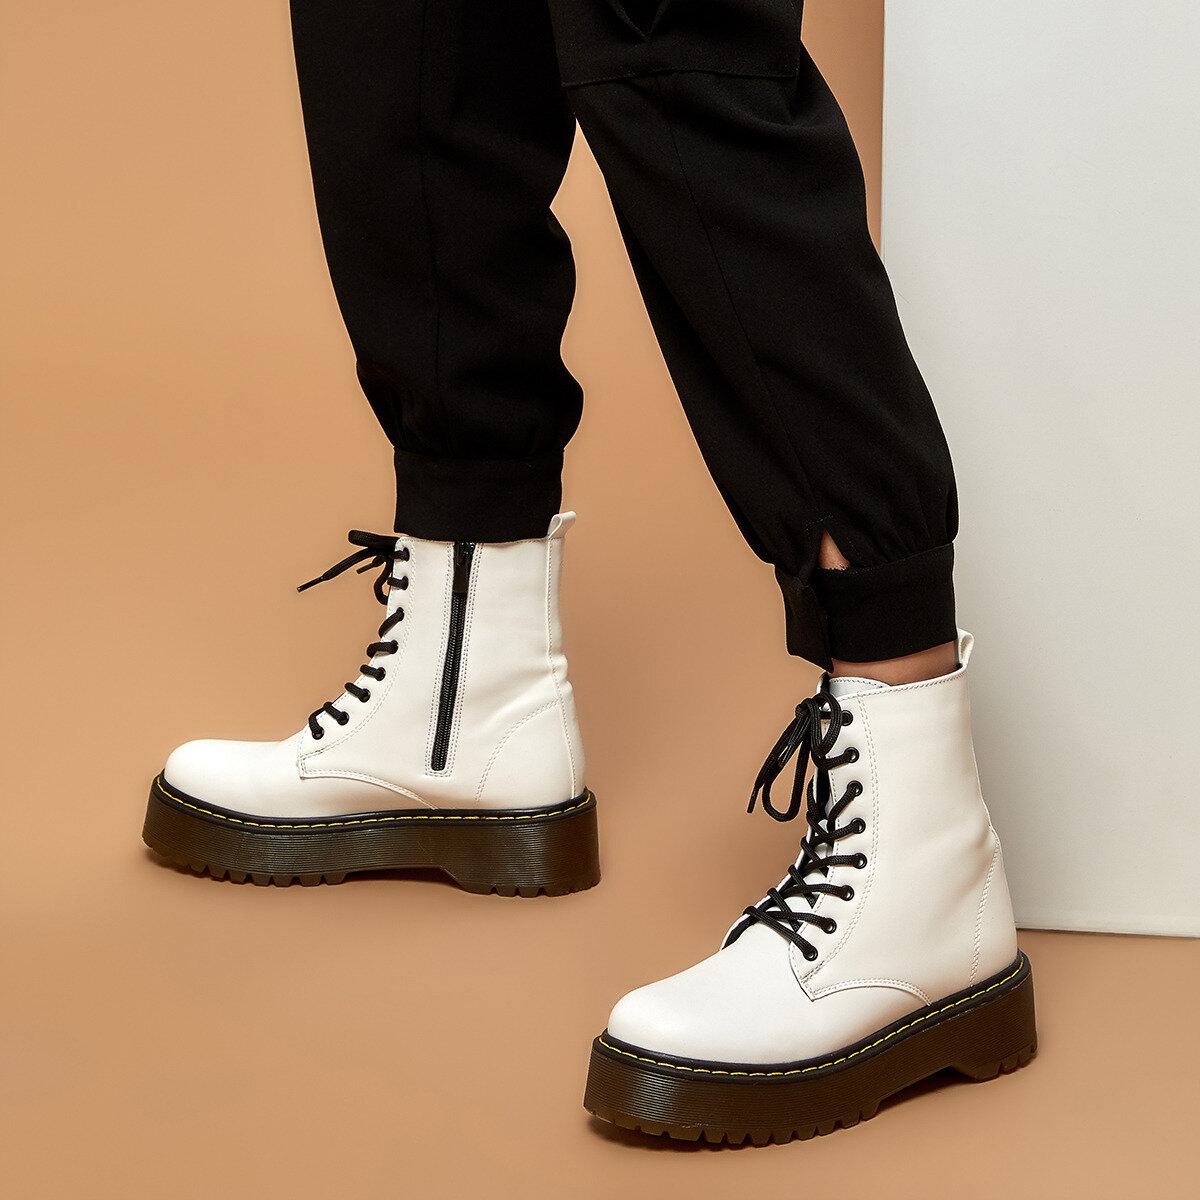 FLO 19K-453 White Women 'S Boots BUTIGO